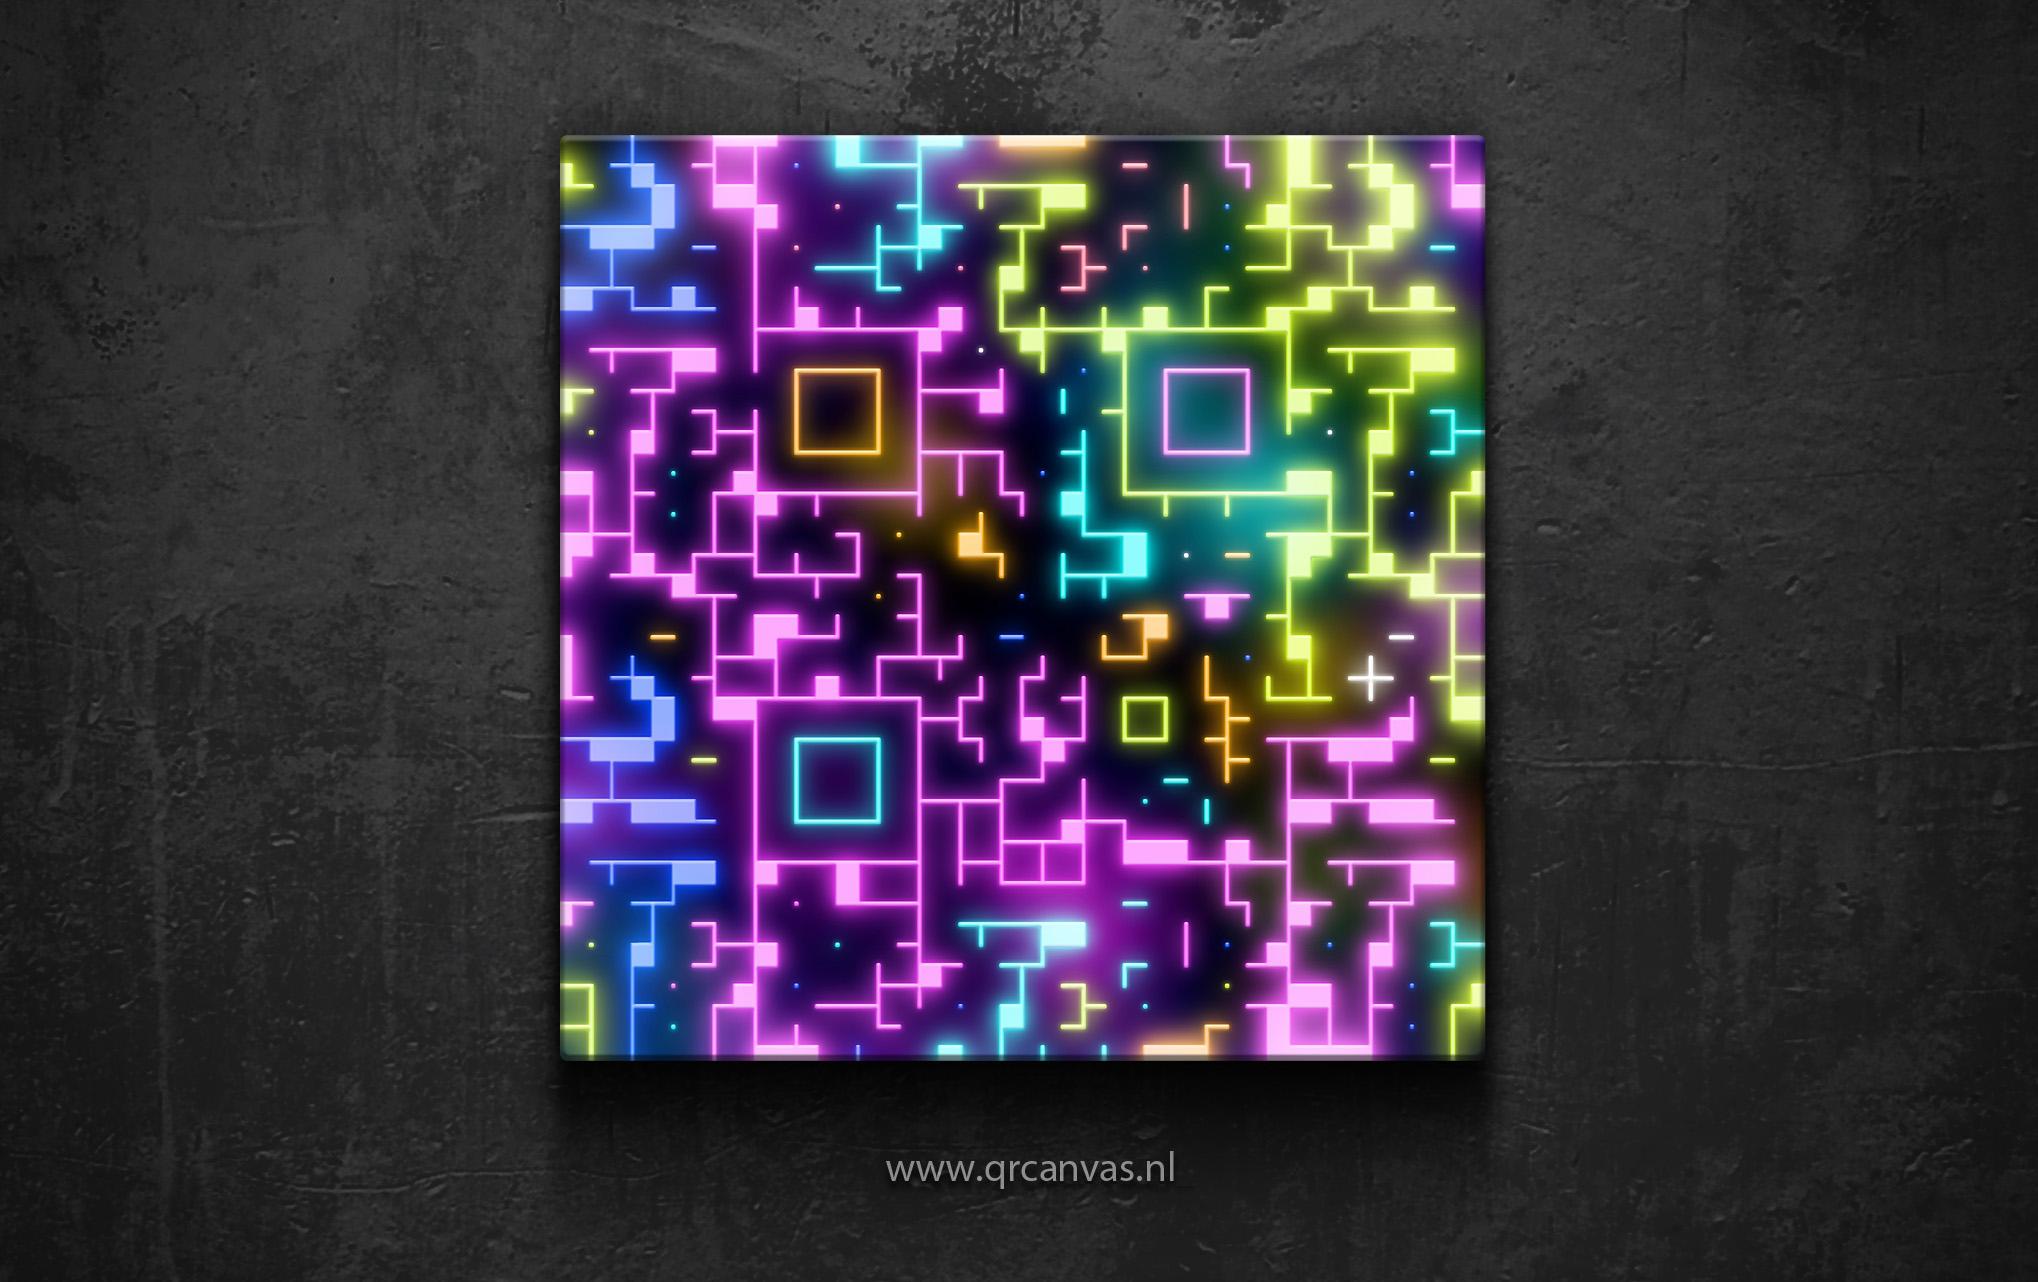 qr code art neon design by leconte on deviantart. Black Bedroom Furniture Sets. Home Design Ideas